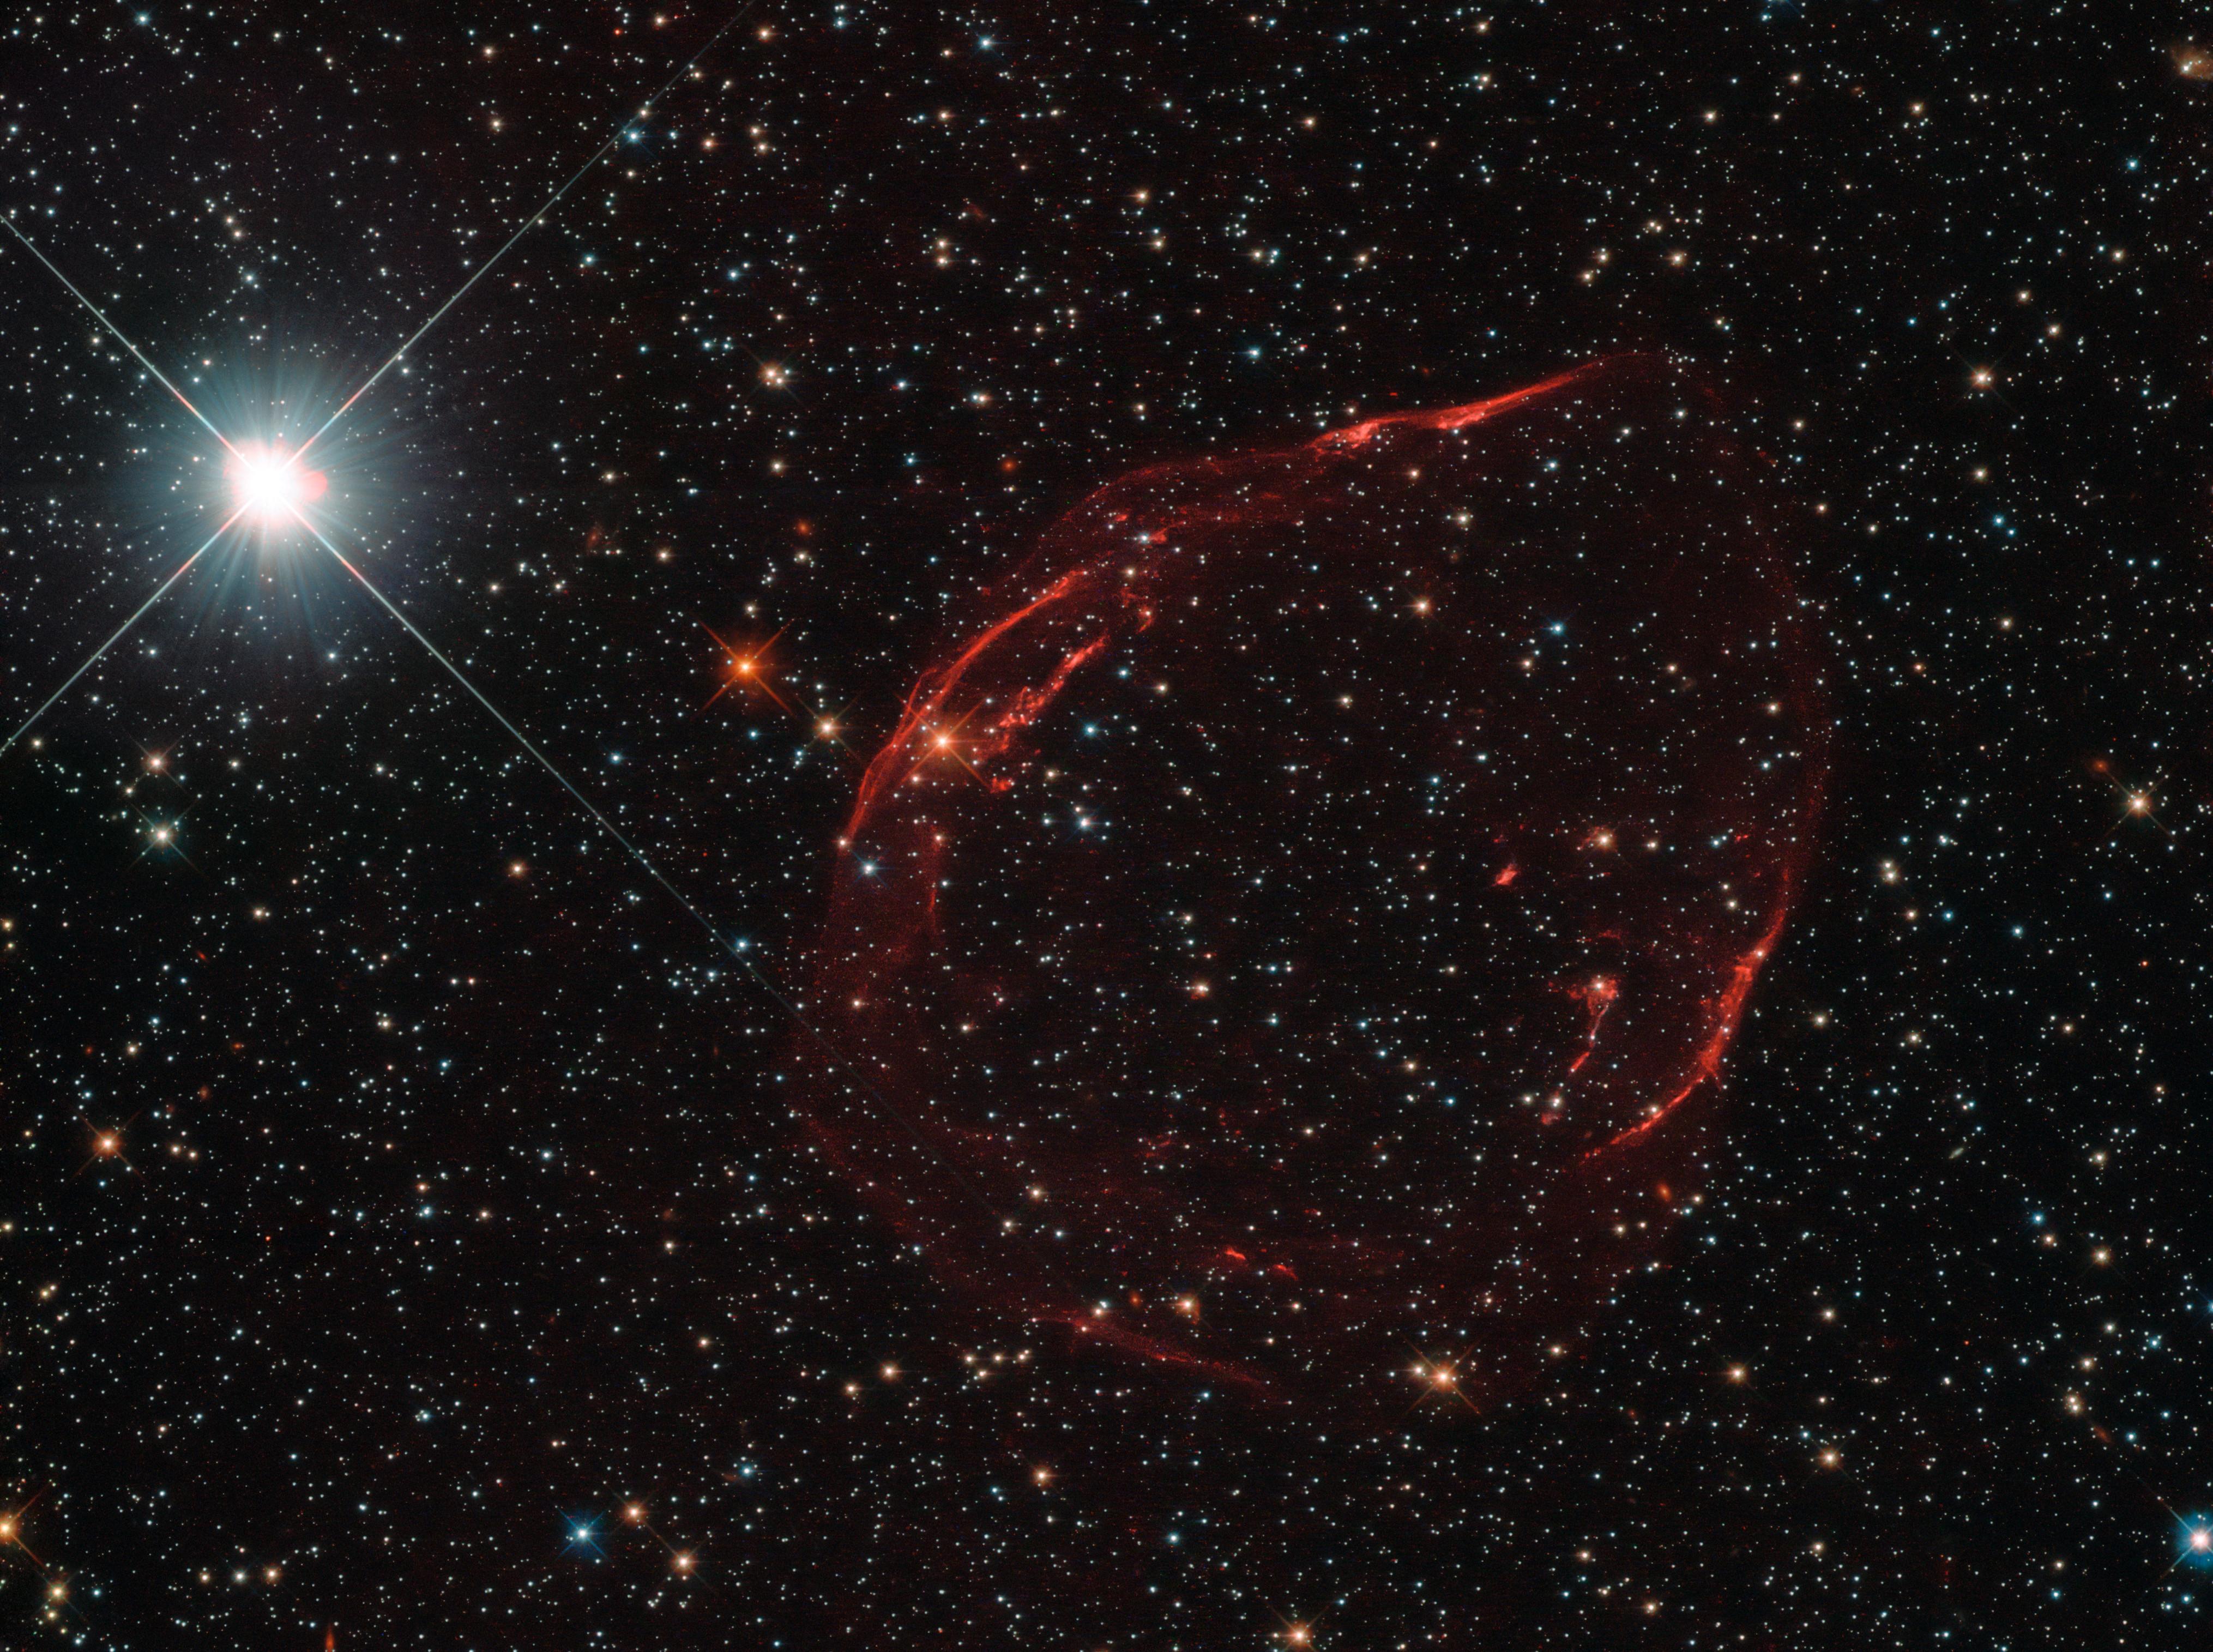 Space in Images - 2016 - 08 - Stellar shrapnel